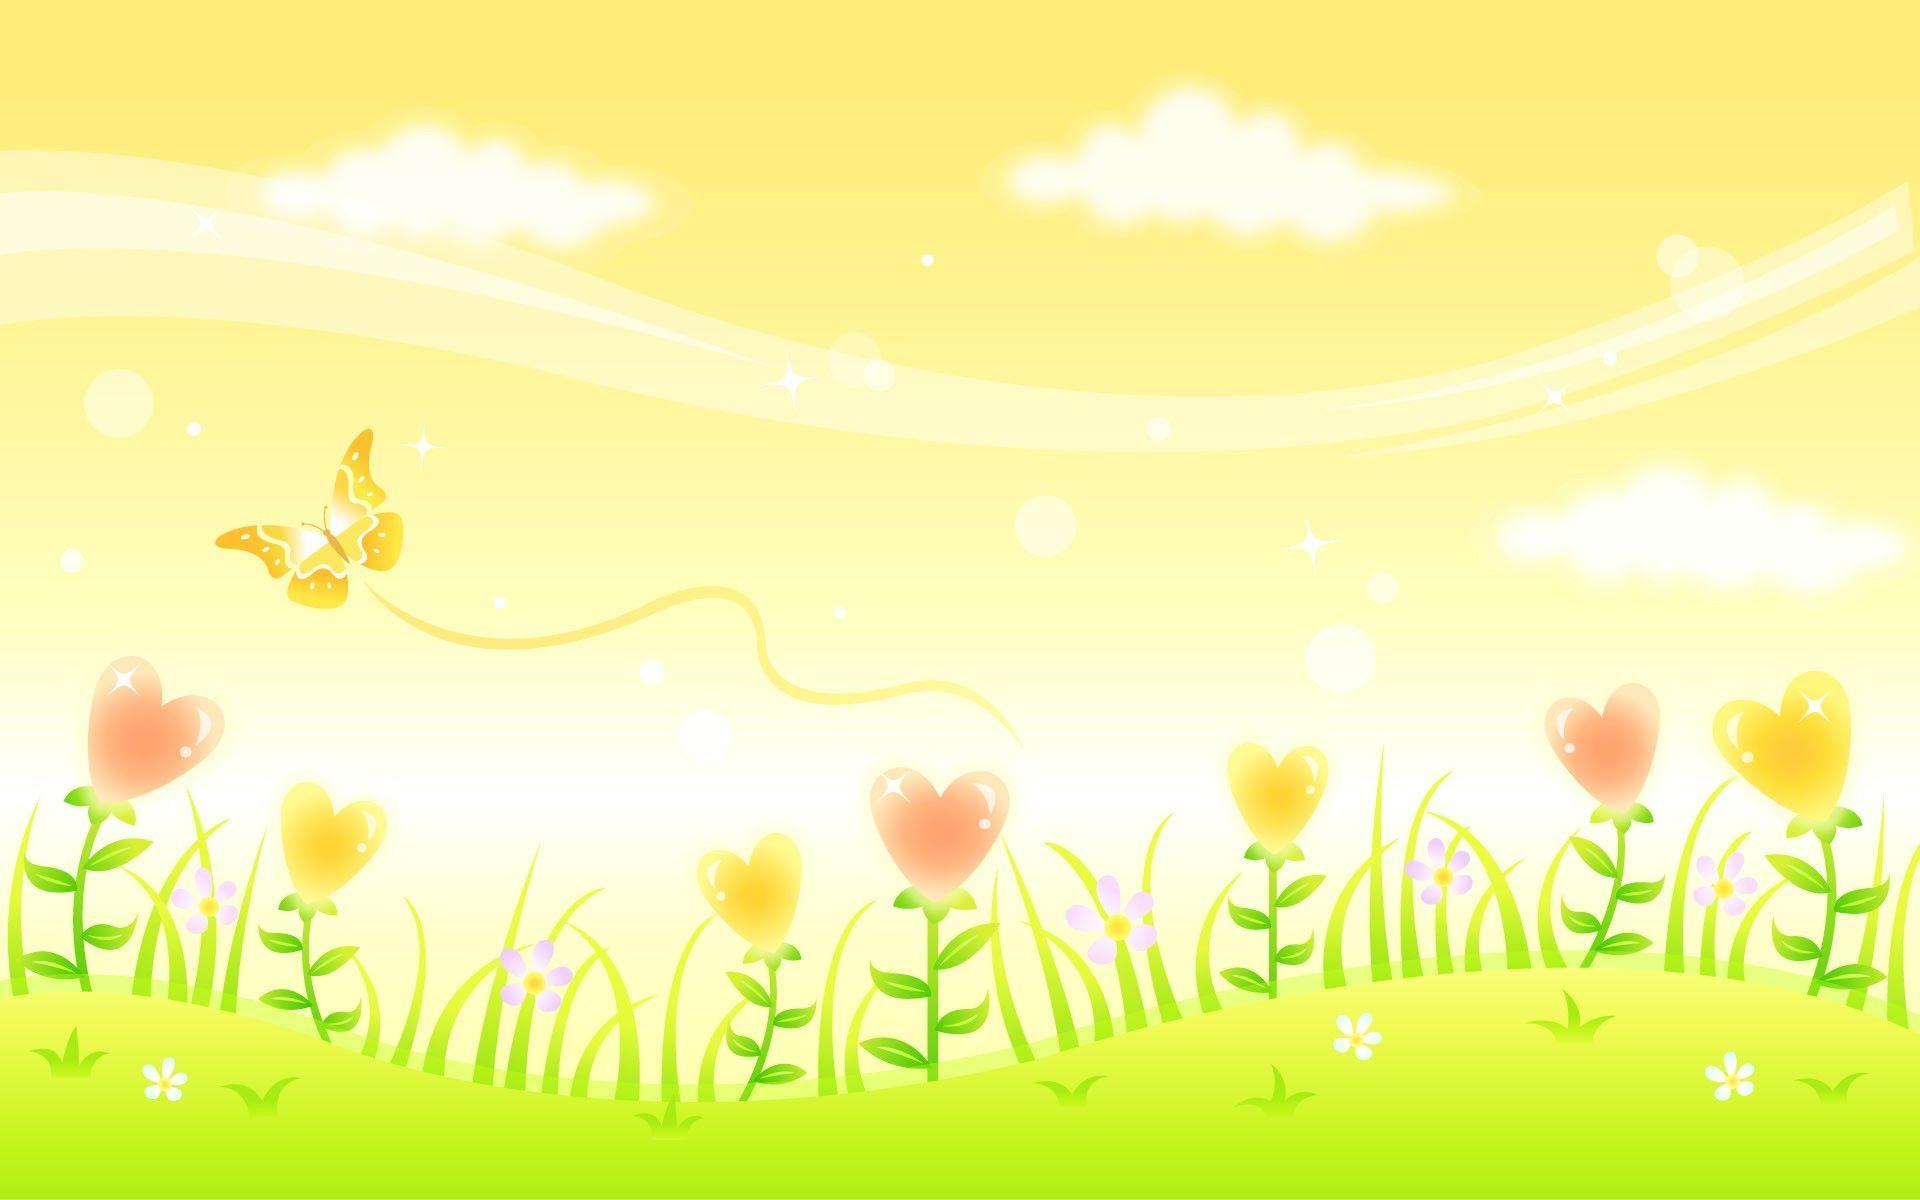 Cartoon Backgrounds Image  Wallpaper Cave